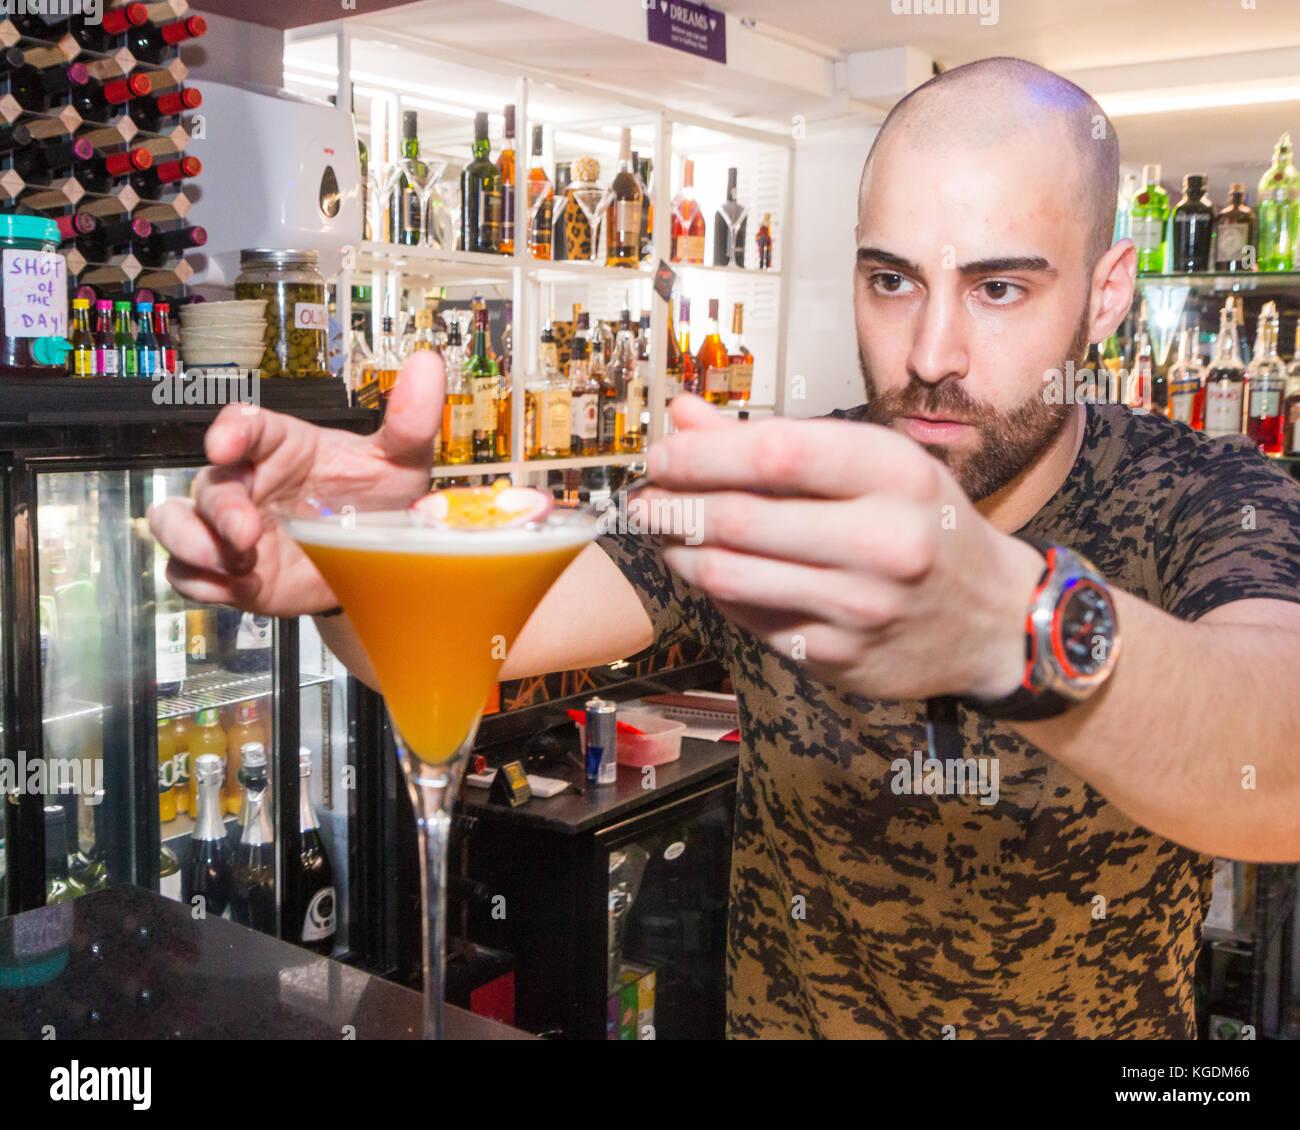 Barman preparing a cocktail - Stock Image